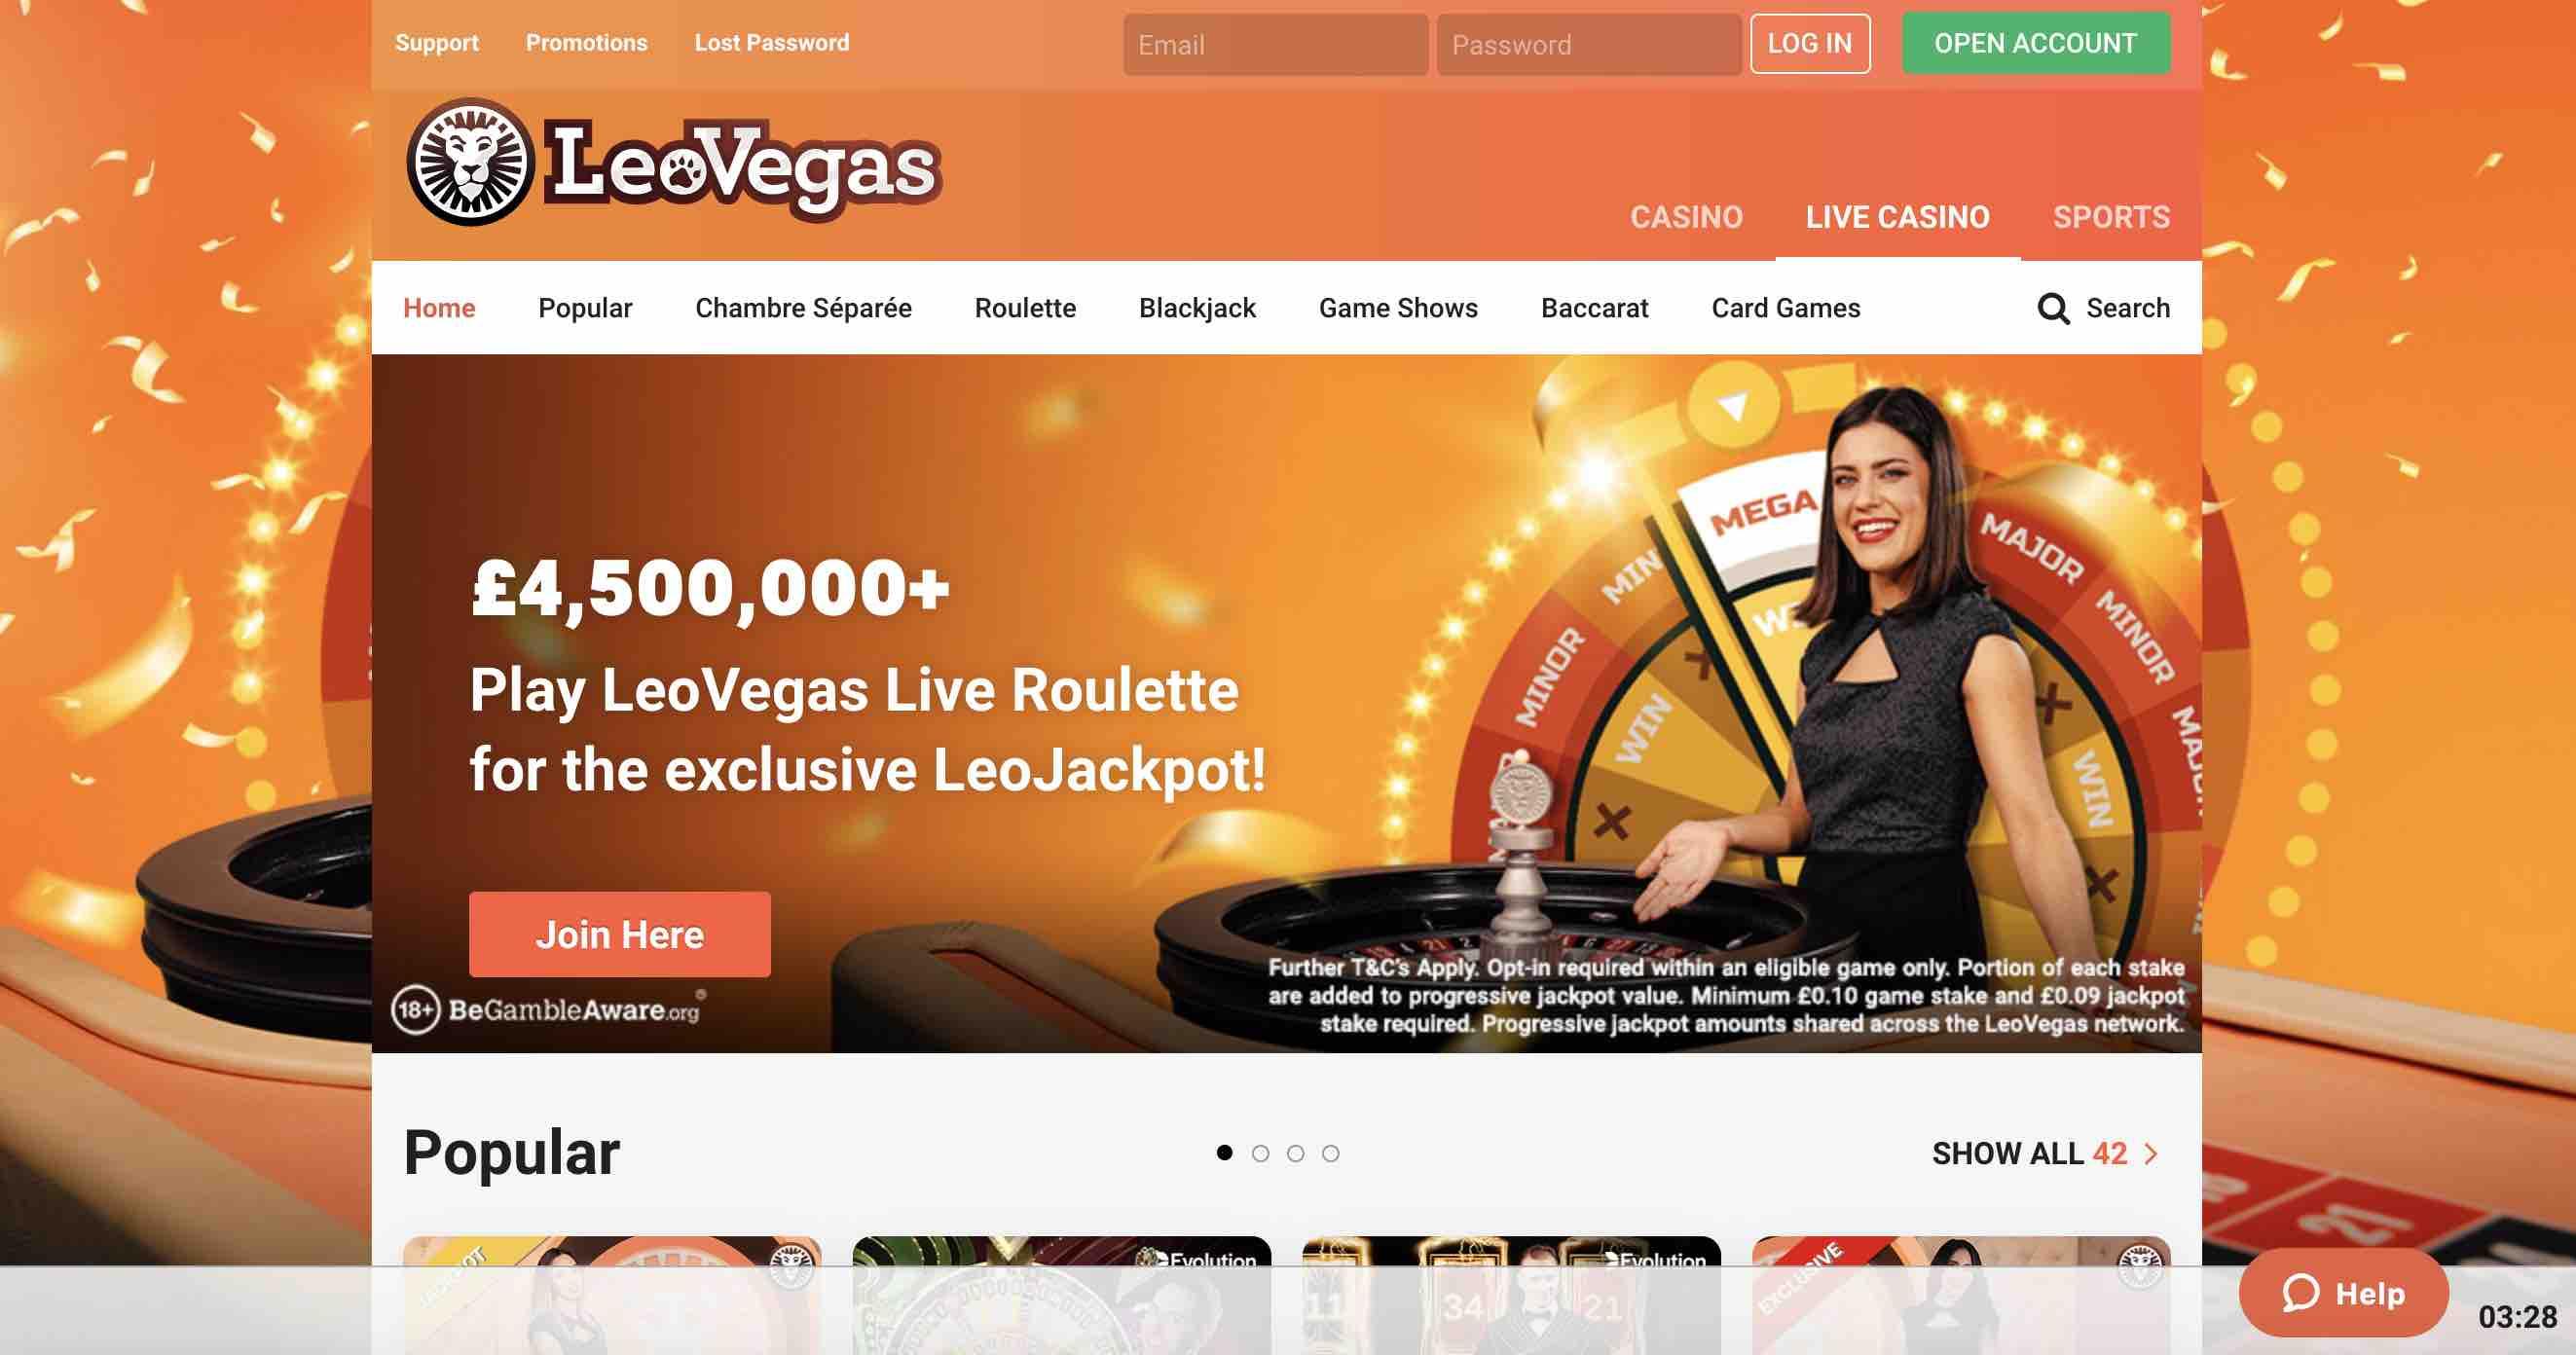 LeoVegas Casino Live Games